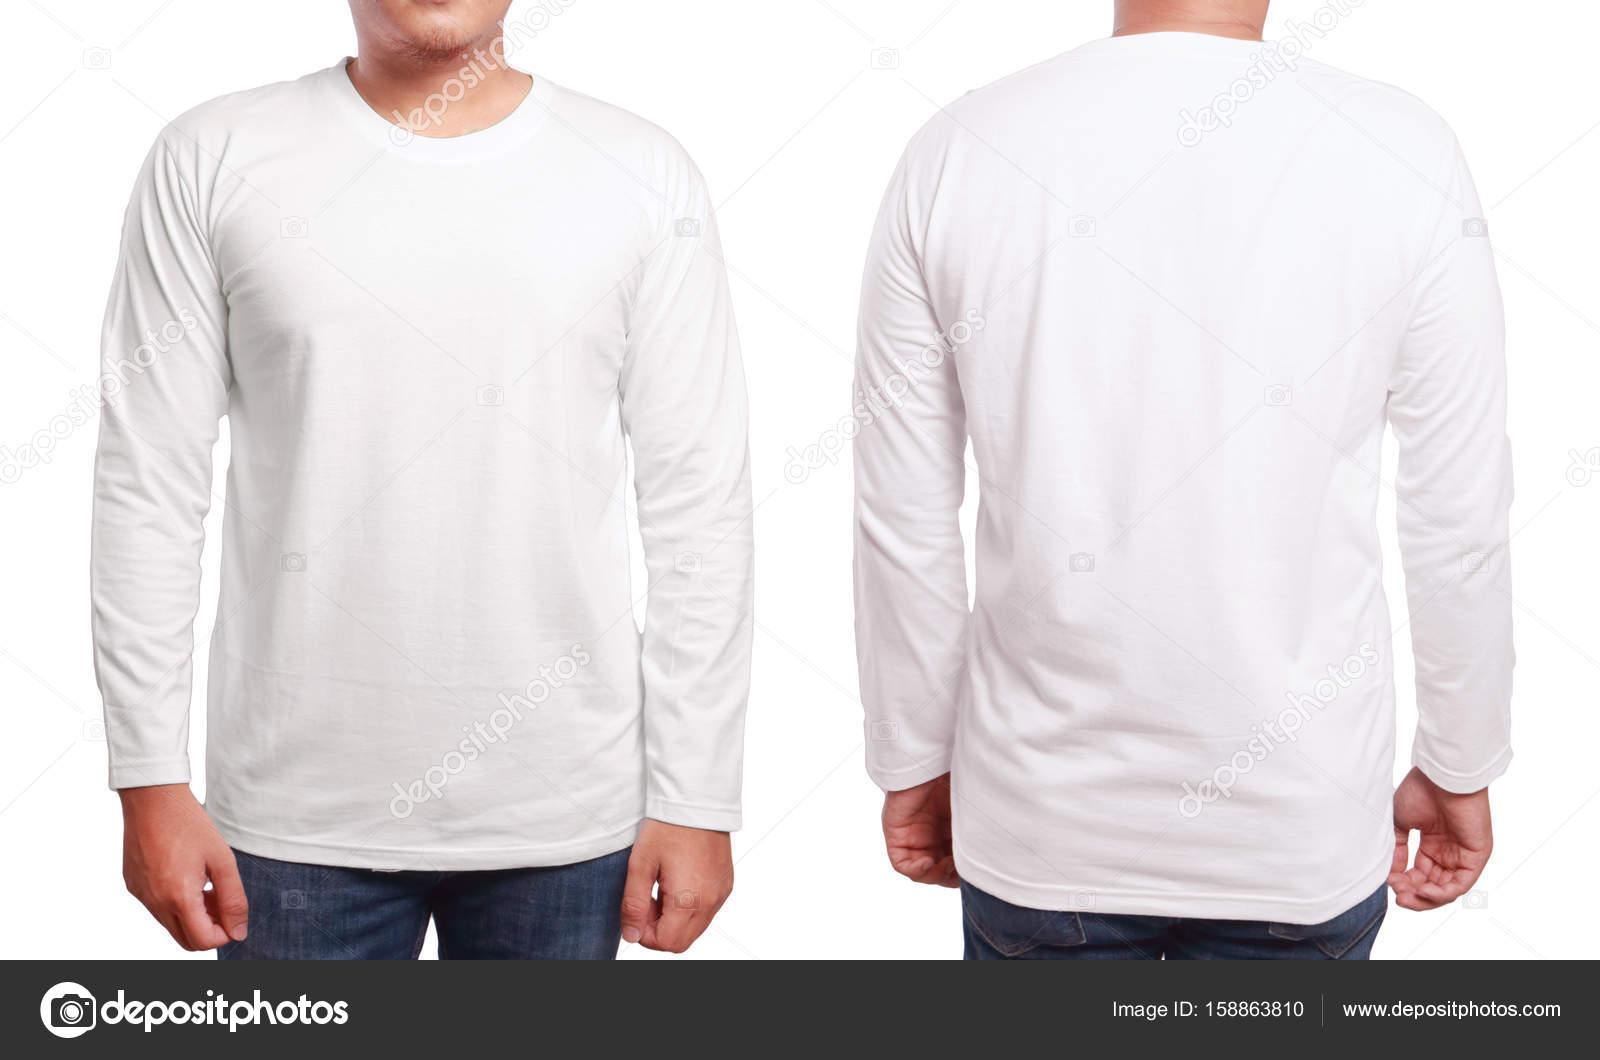 96d6cdf1a Modelo de Design de camisa de mangas compridas longo branco — Stock ...